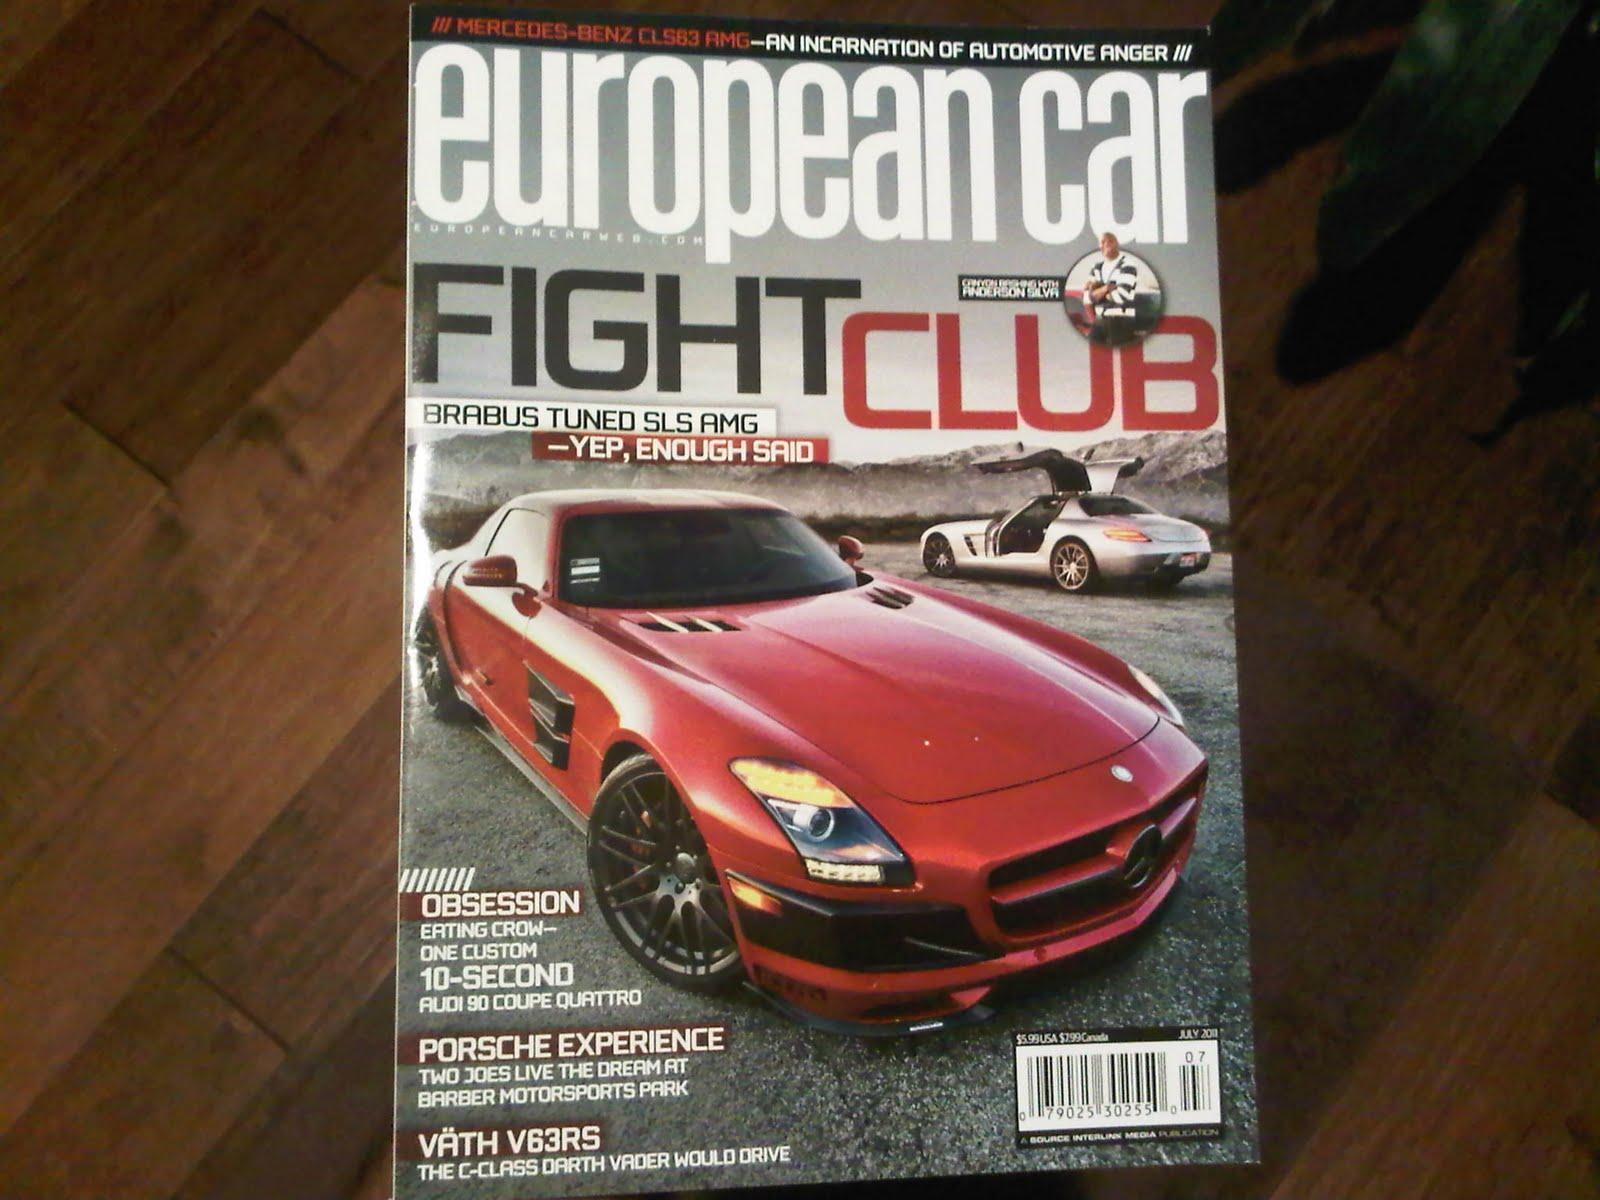 http://4.bp.blogspot.com/-qzIKxH-kVa0/TeQUfW7Yz2I/AAAAAAAAAZo/SoSTetjL2VI/s1600/Singh+Autosport+European+Car+Magazine.jpg